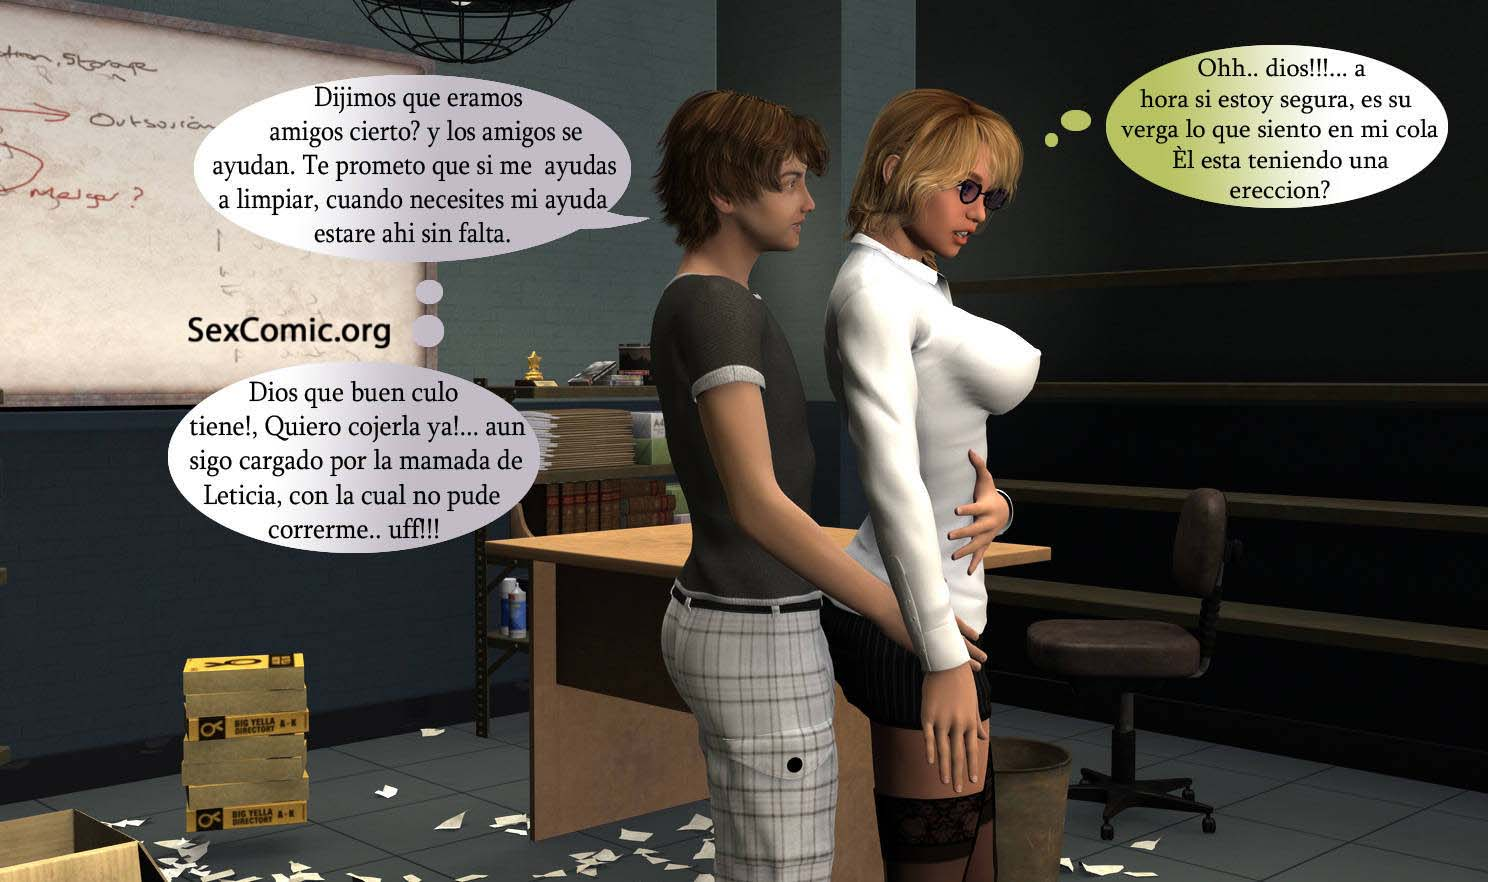 comic-xxx-3d-seduciendo-alas-empleadas-de-mama-historias-sexuales-mangas-para-adultos-videos-deincesto-comics-xxx-historias-eroticas-fantacias-sexuales-gtaris-online-30